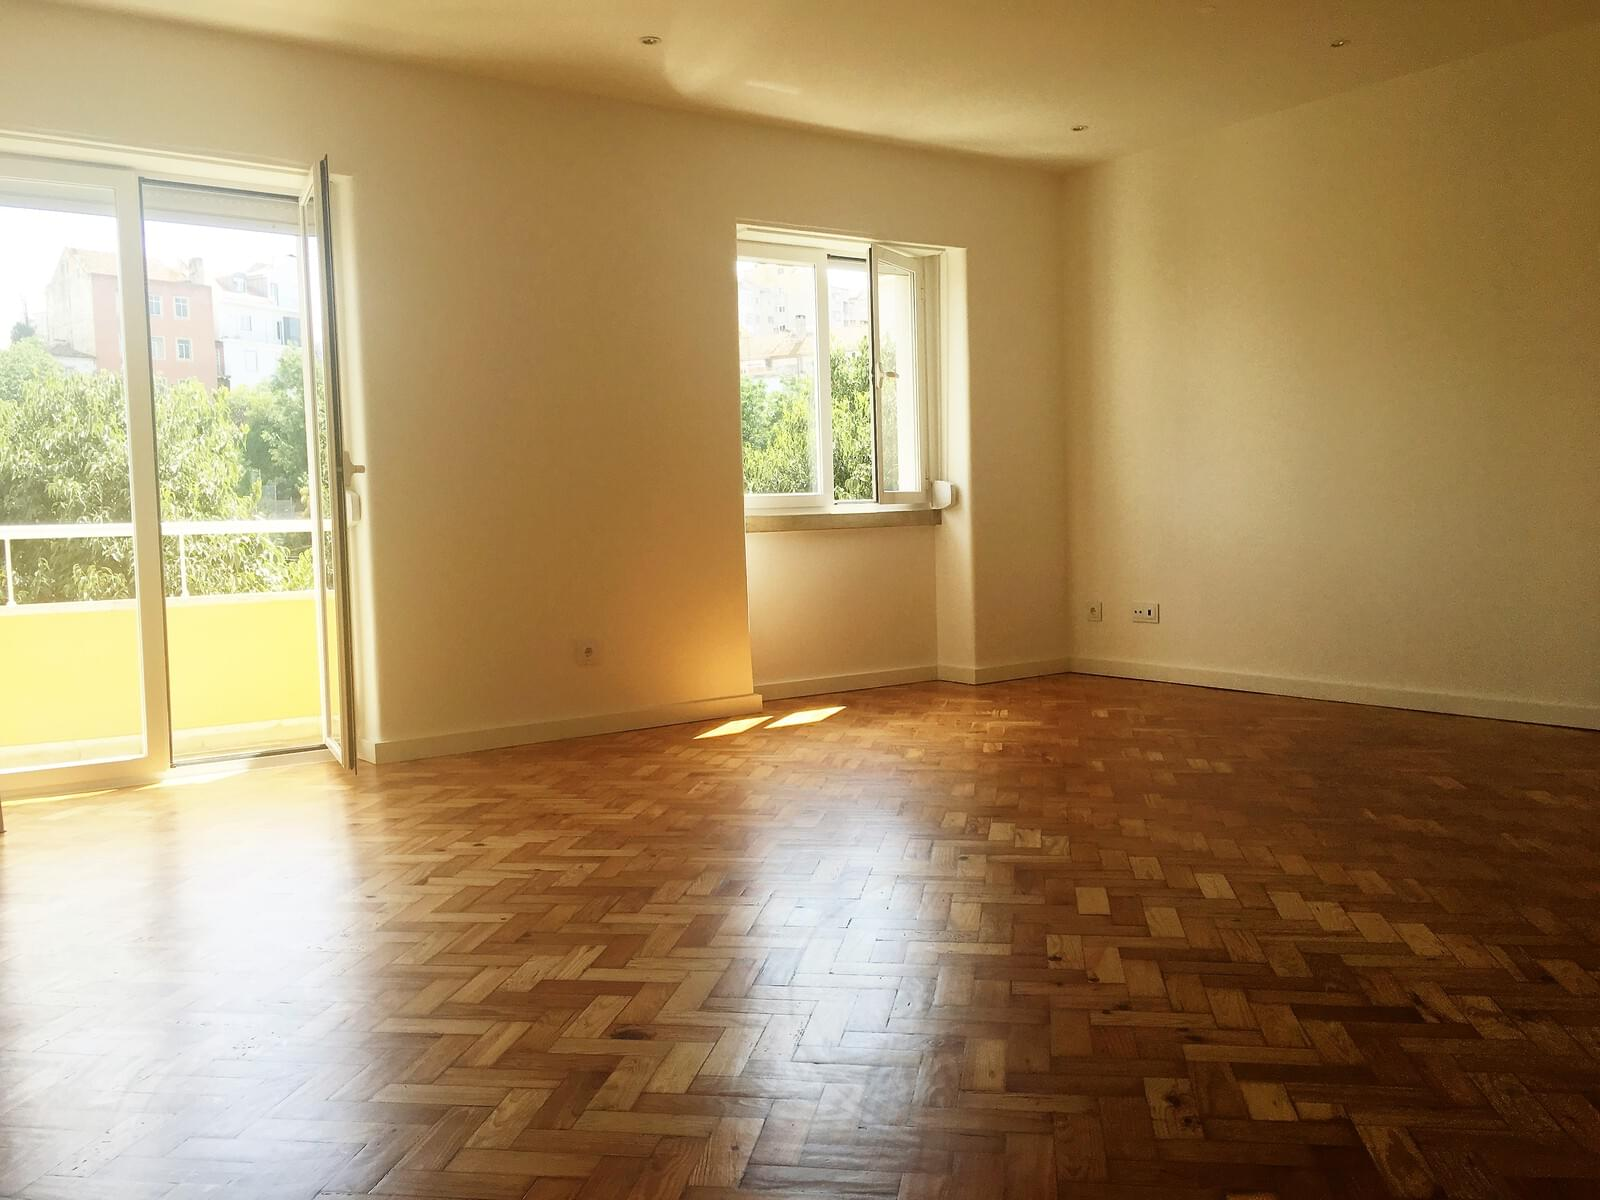 pf17642-apartamento-t3-lisboa-1e09520f-17d1-4db3-8eb4-969e2fdcca82